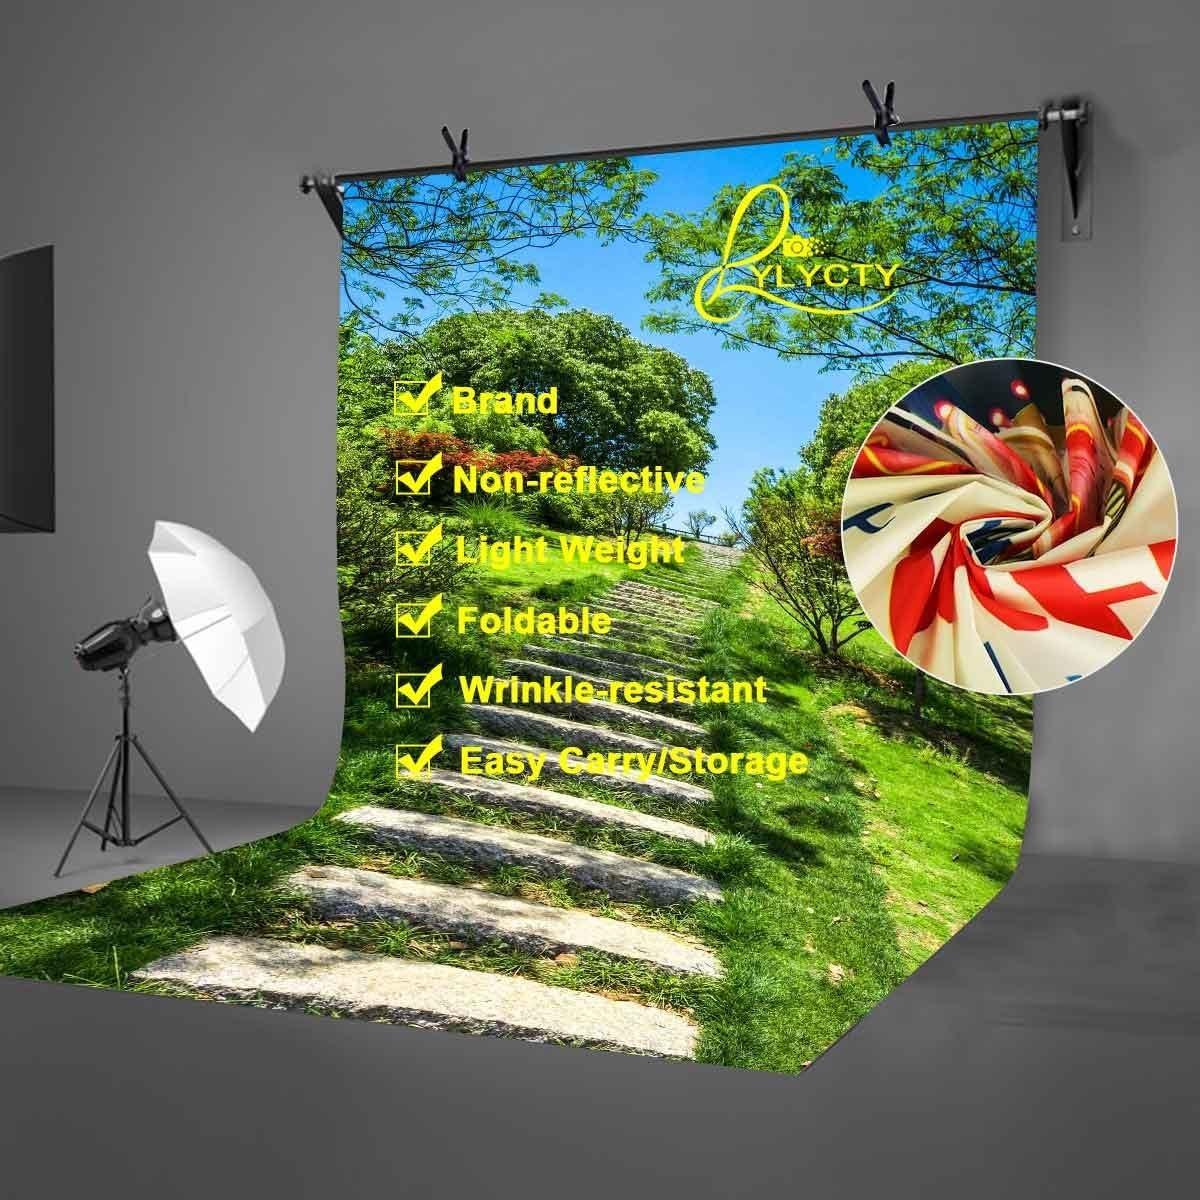 LYLYCTY 5X7ft Wetland Park Backdrop Green Tree Grass Environment Beautiful Wetland Park Photography Backdrop Photo Photography Background Props Studio Indoor Decorations LYLX443